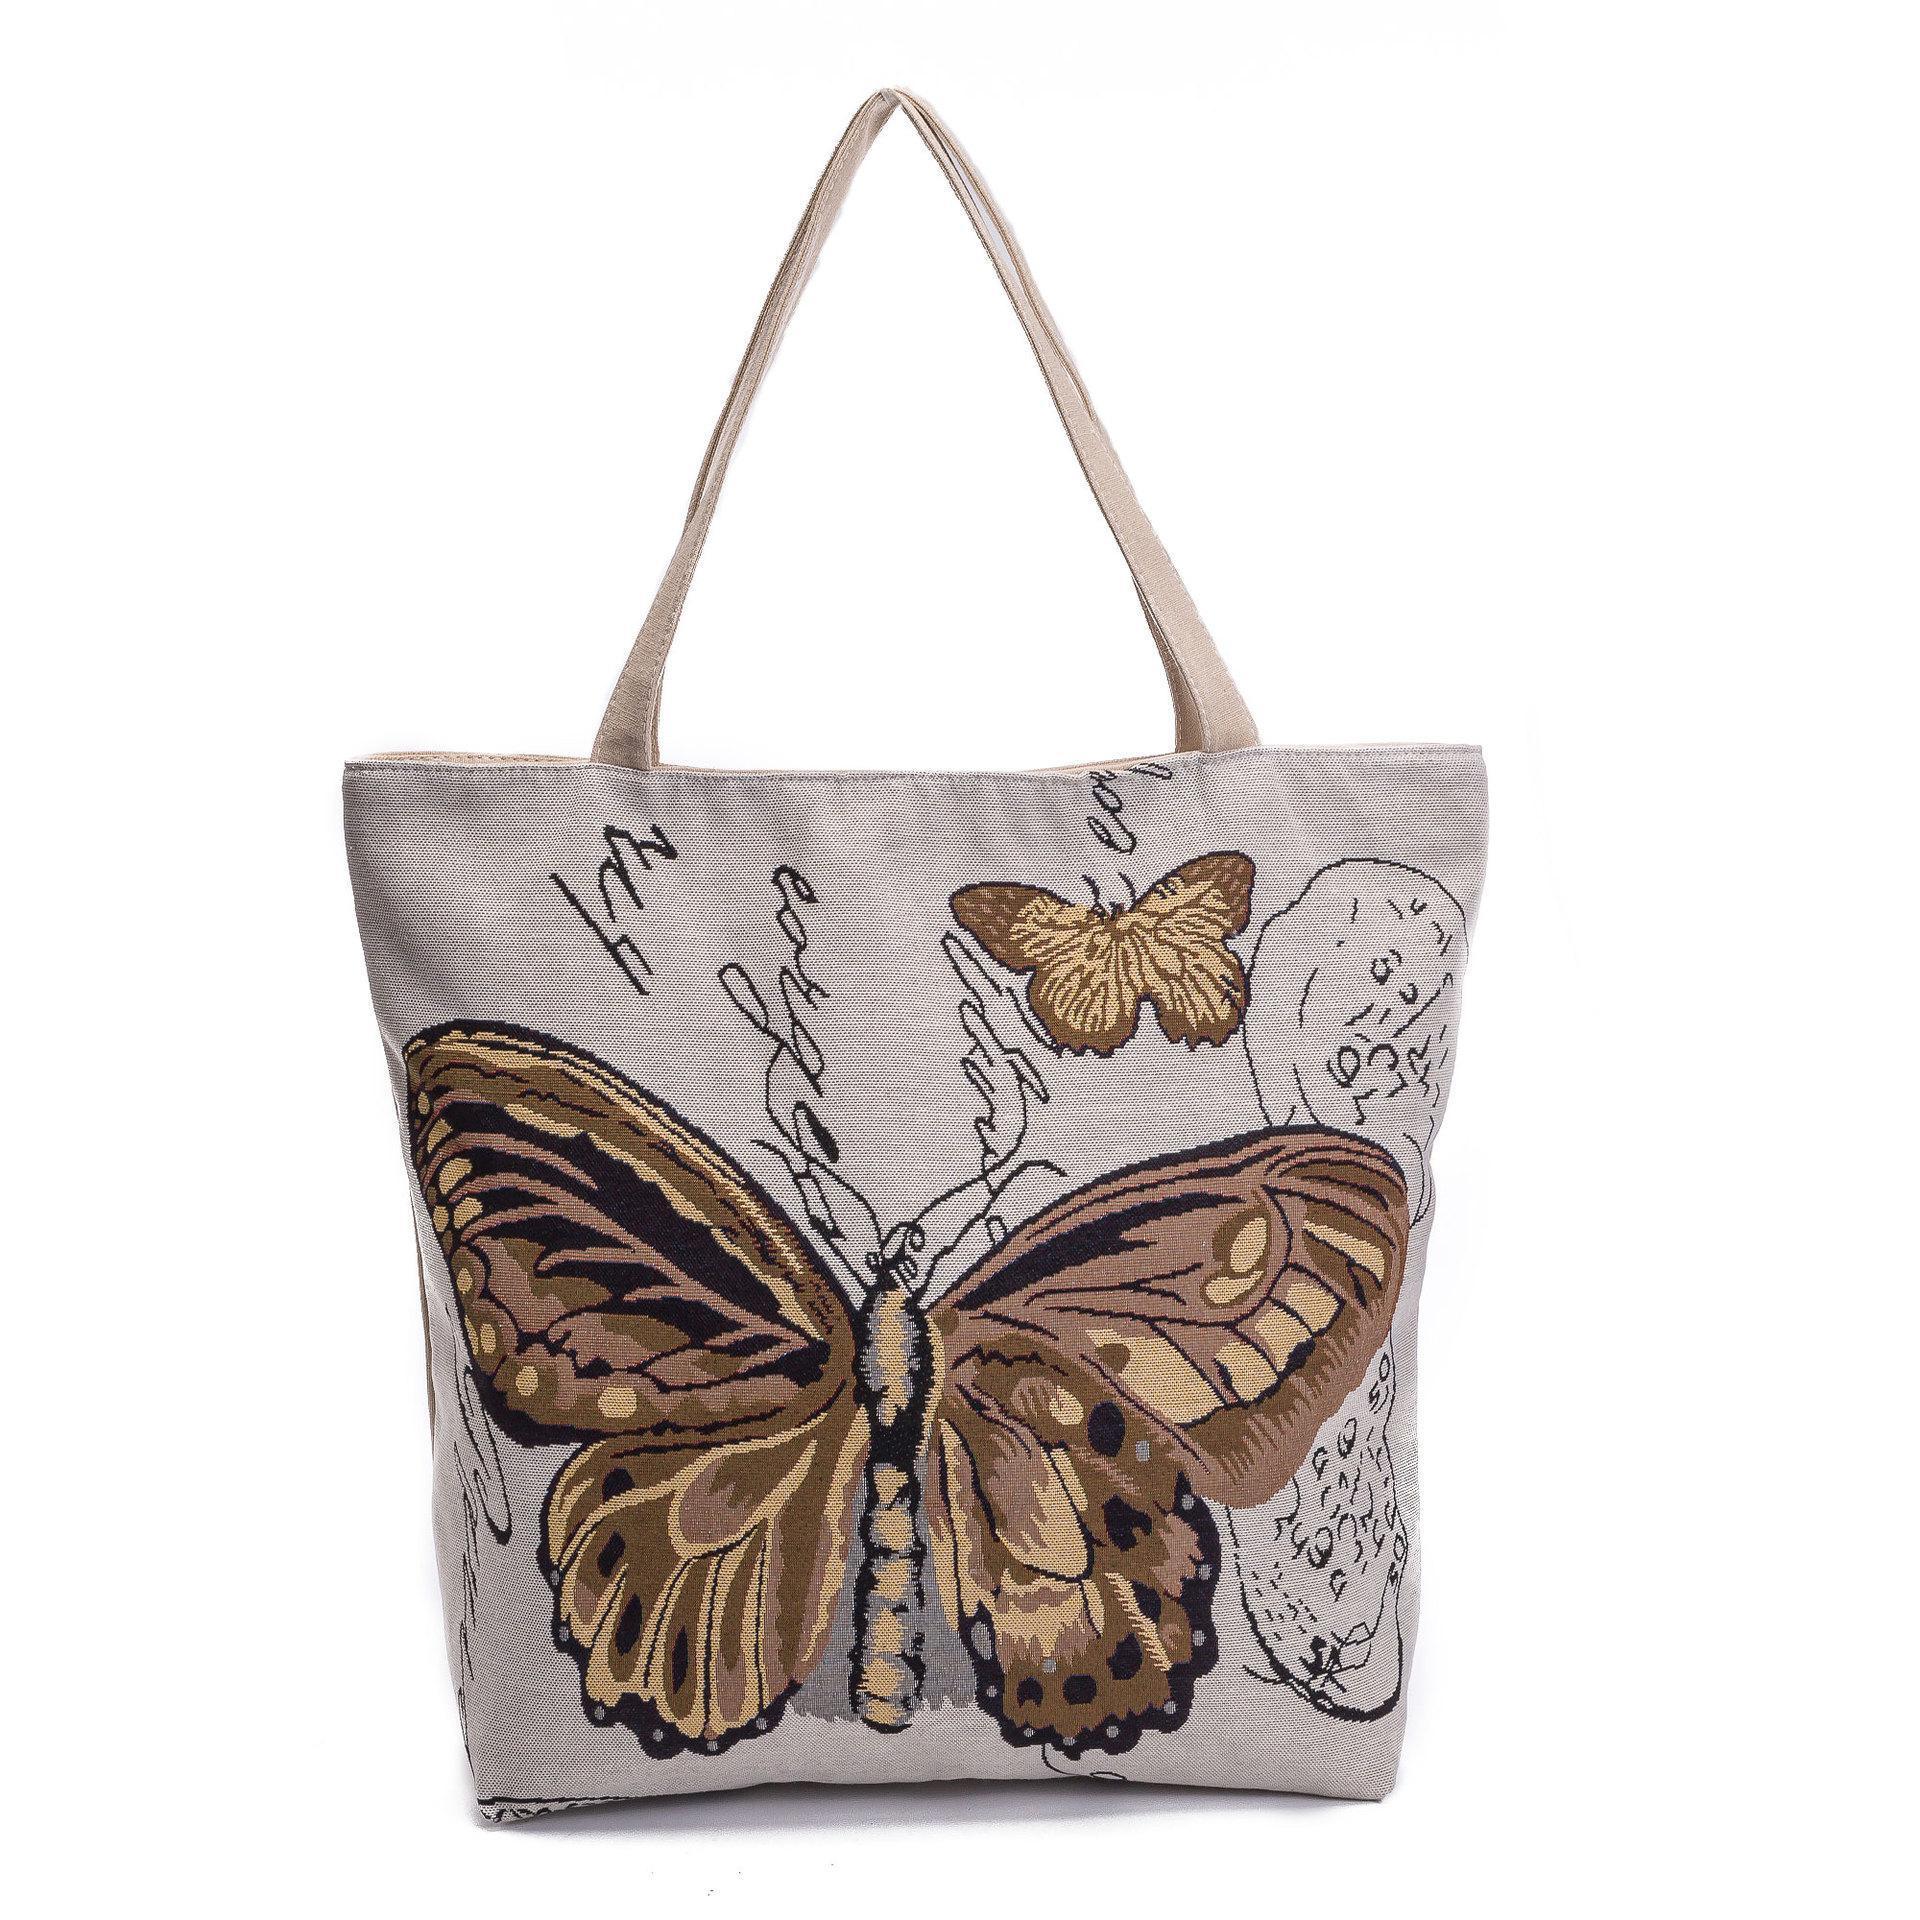 ad717ff8b9b4 Women Fashion Bags Retro Casual Canvas Butterfly Printed Shopping Bags  Female Single Shoulder Handbags Pouch Ladies Tote Ladies Shoulder Handbags  Women ...